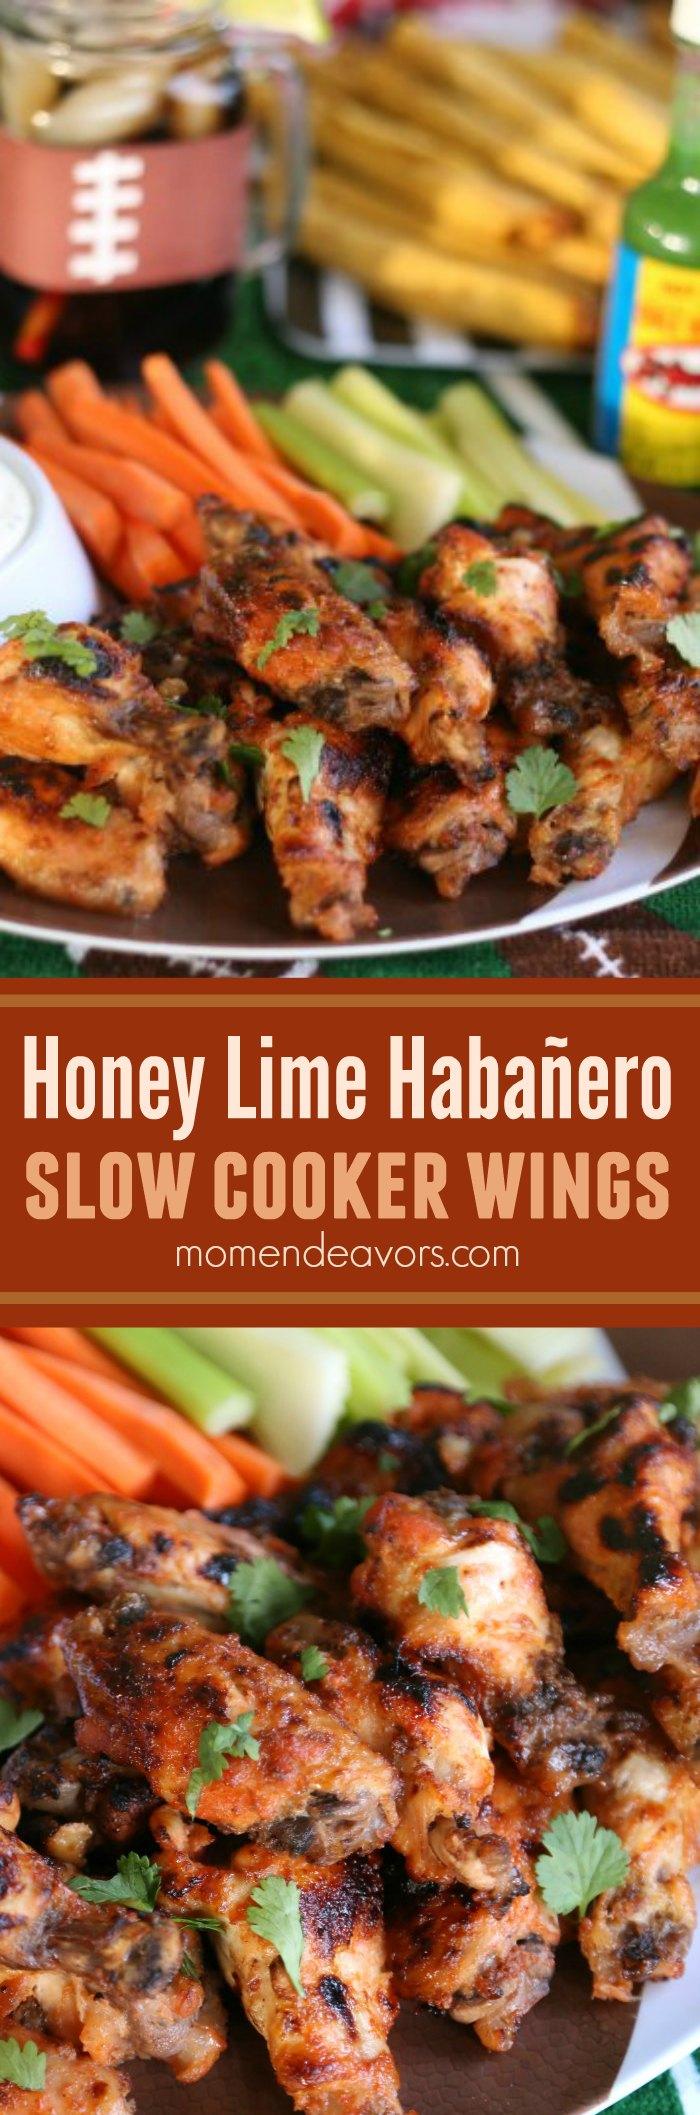 Honey Lime Habañero Slow Cooker Wings